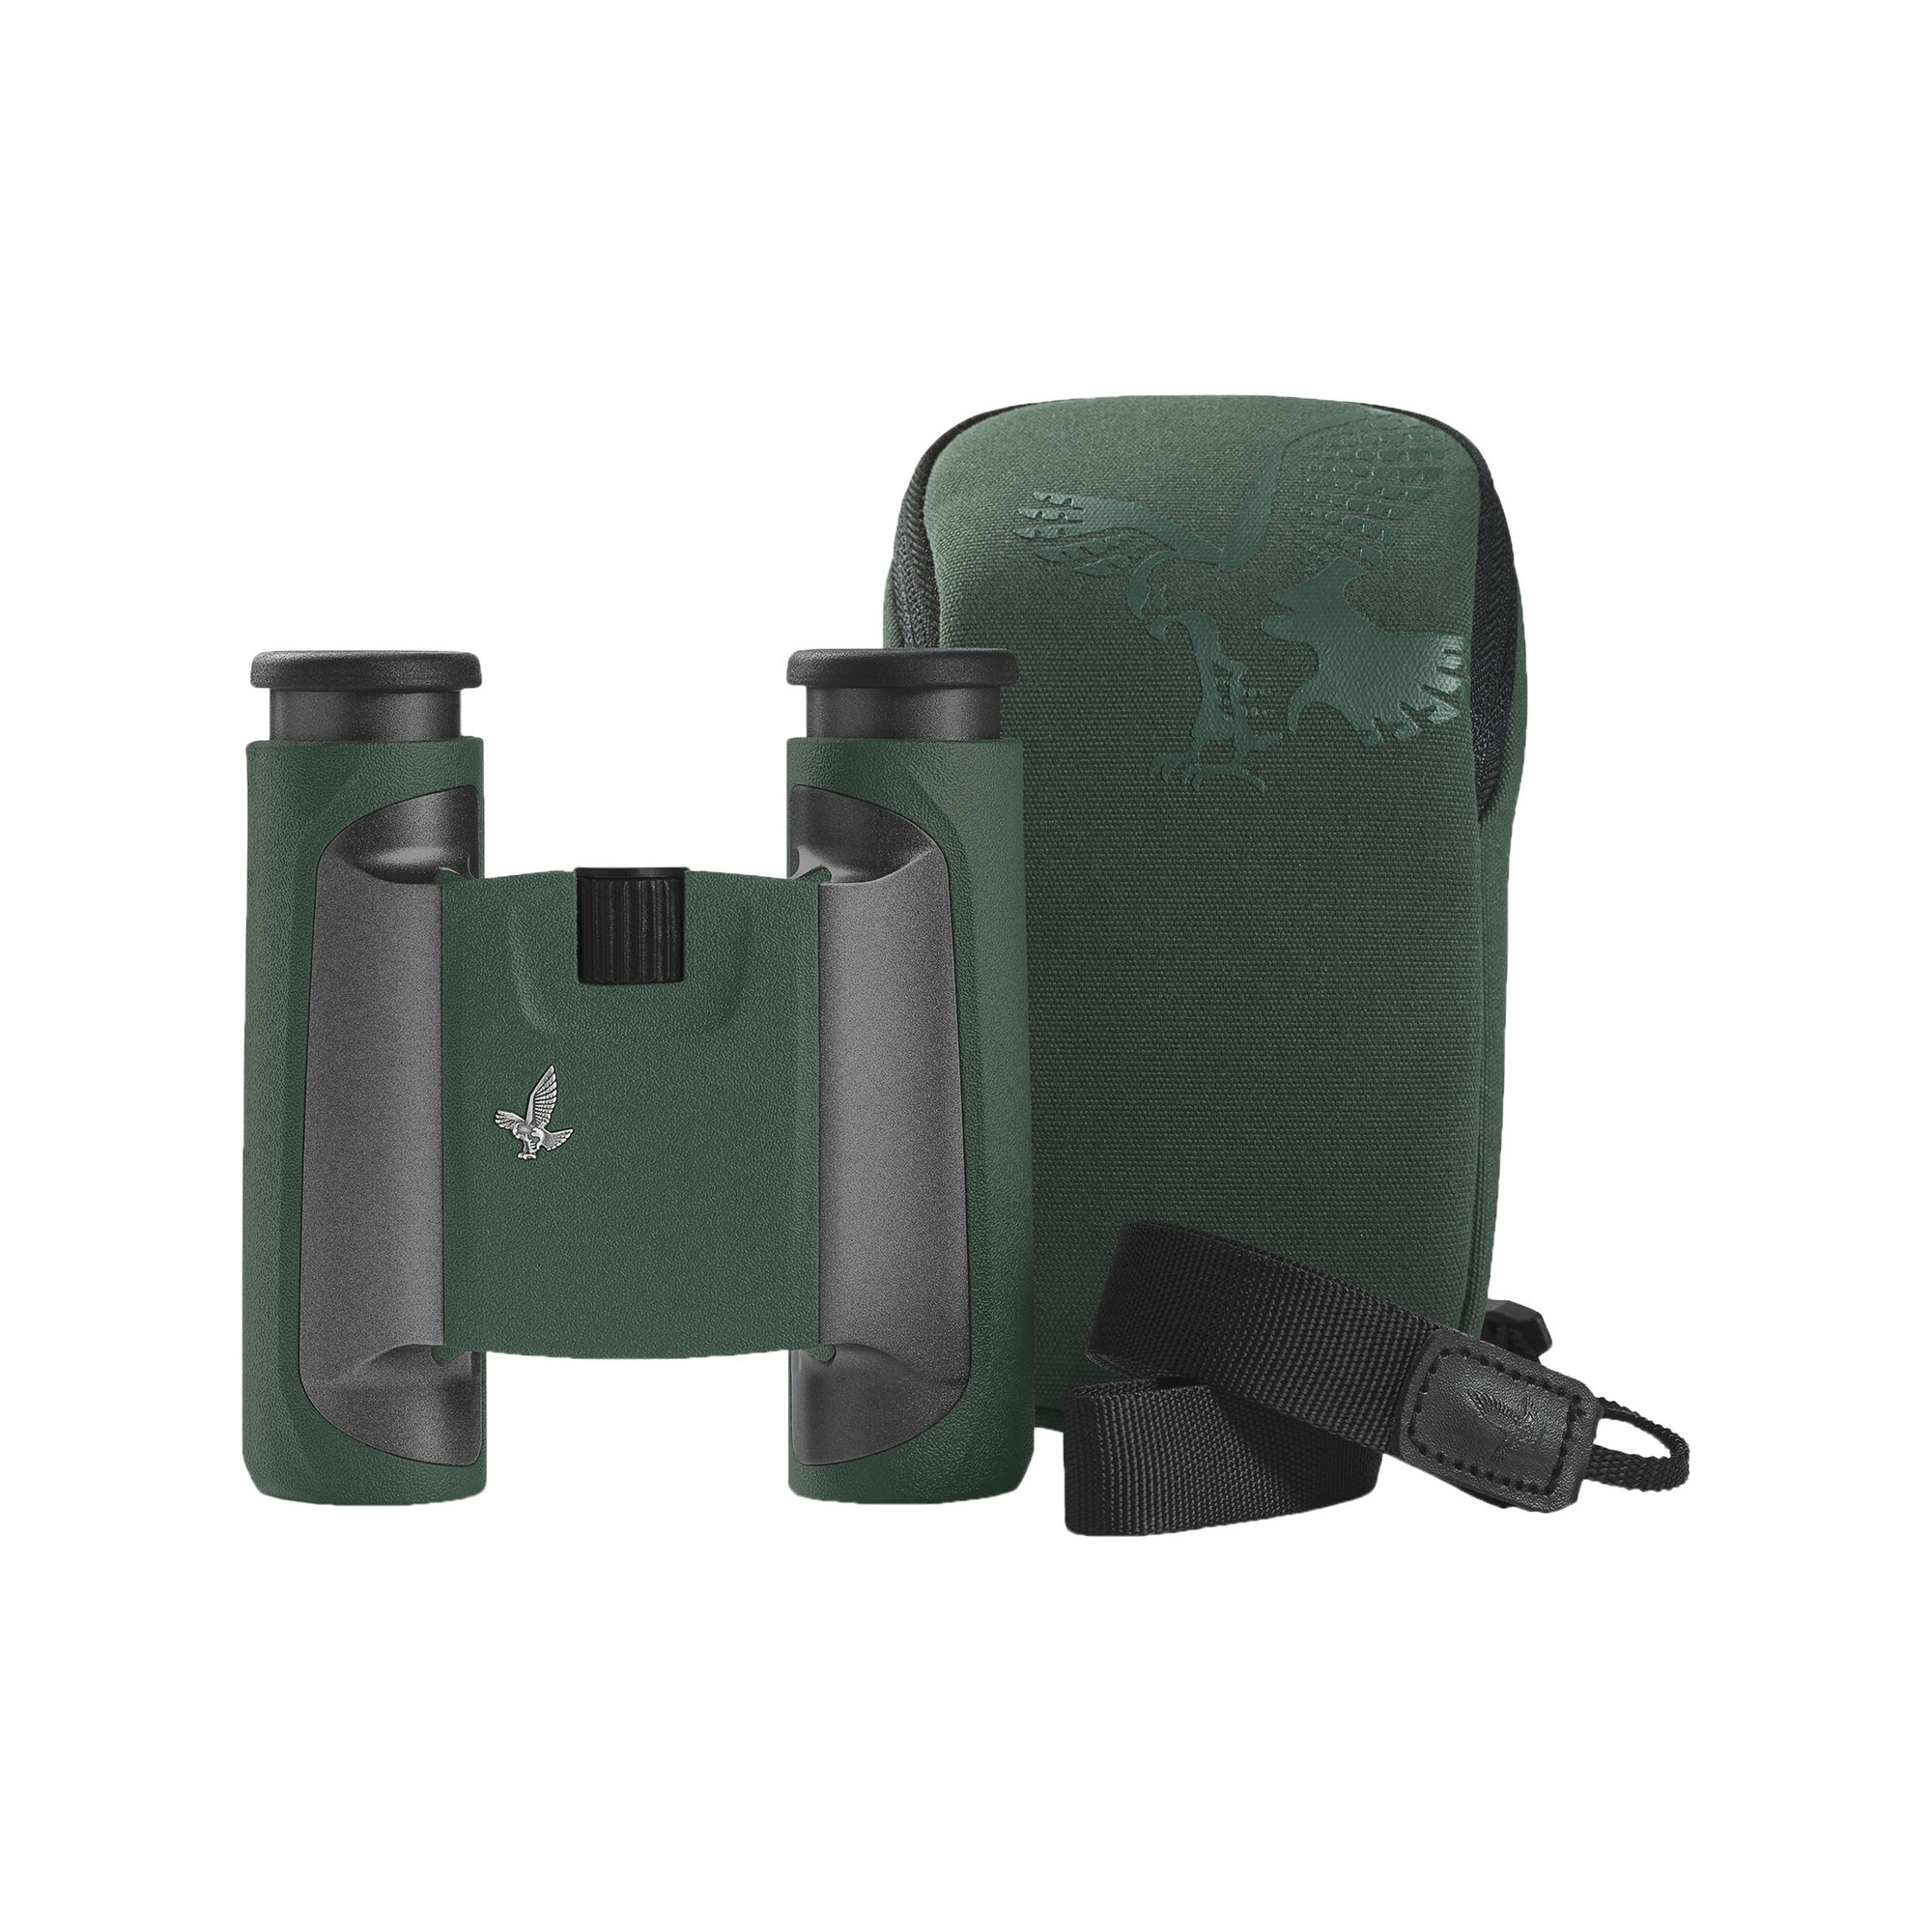 Swarovski CL Pocket 8x25 Grön + WN Wild Nature